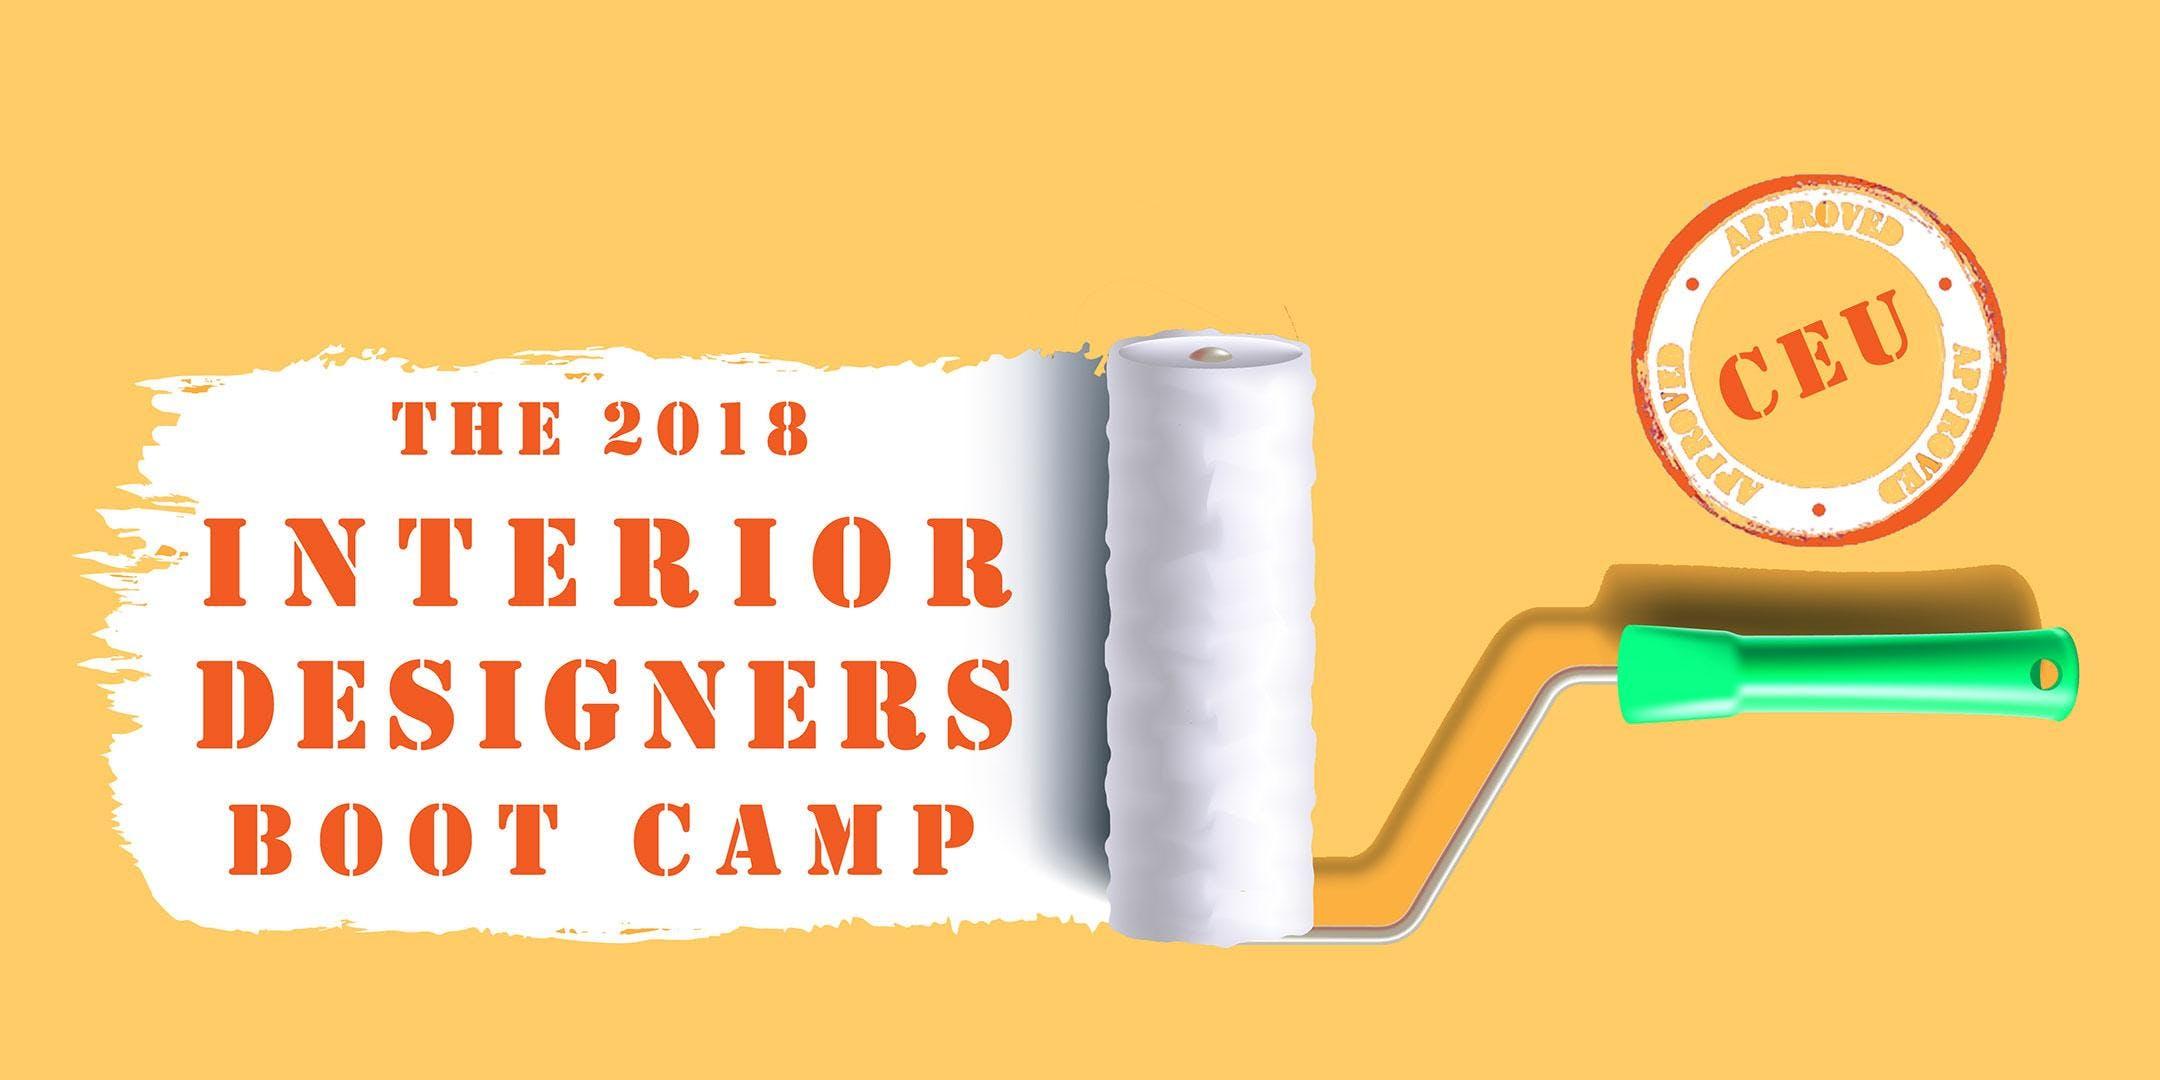 The 2018 Interior Designers Boot Camp